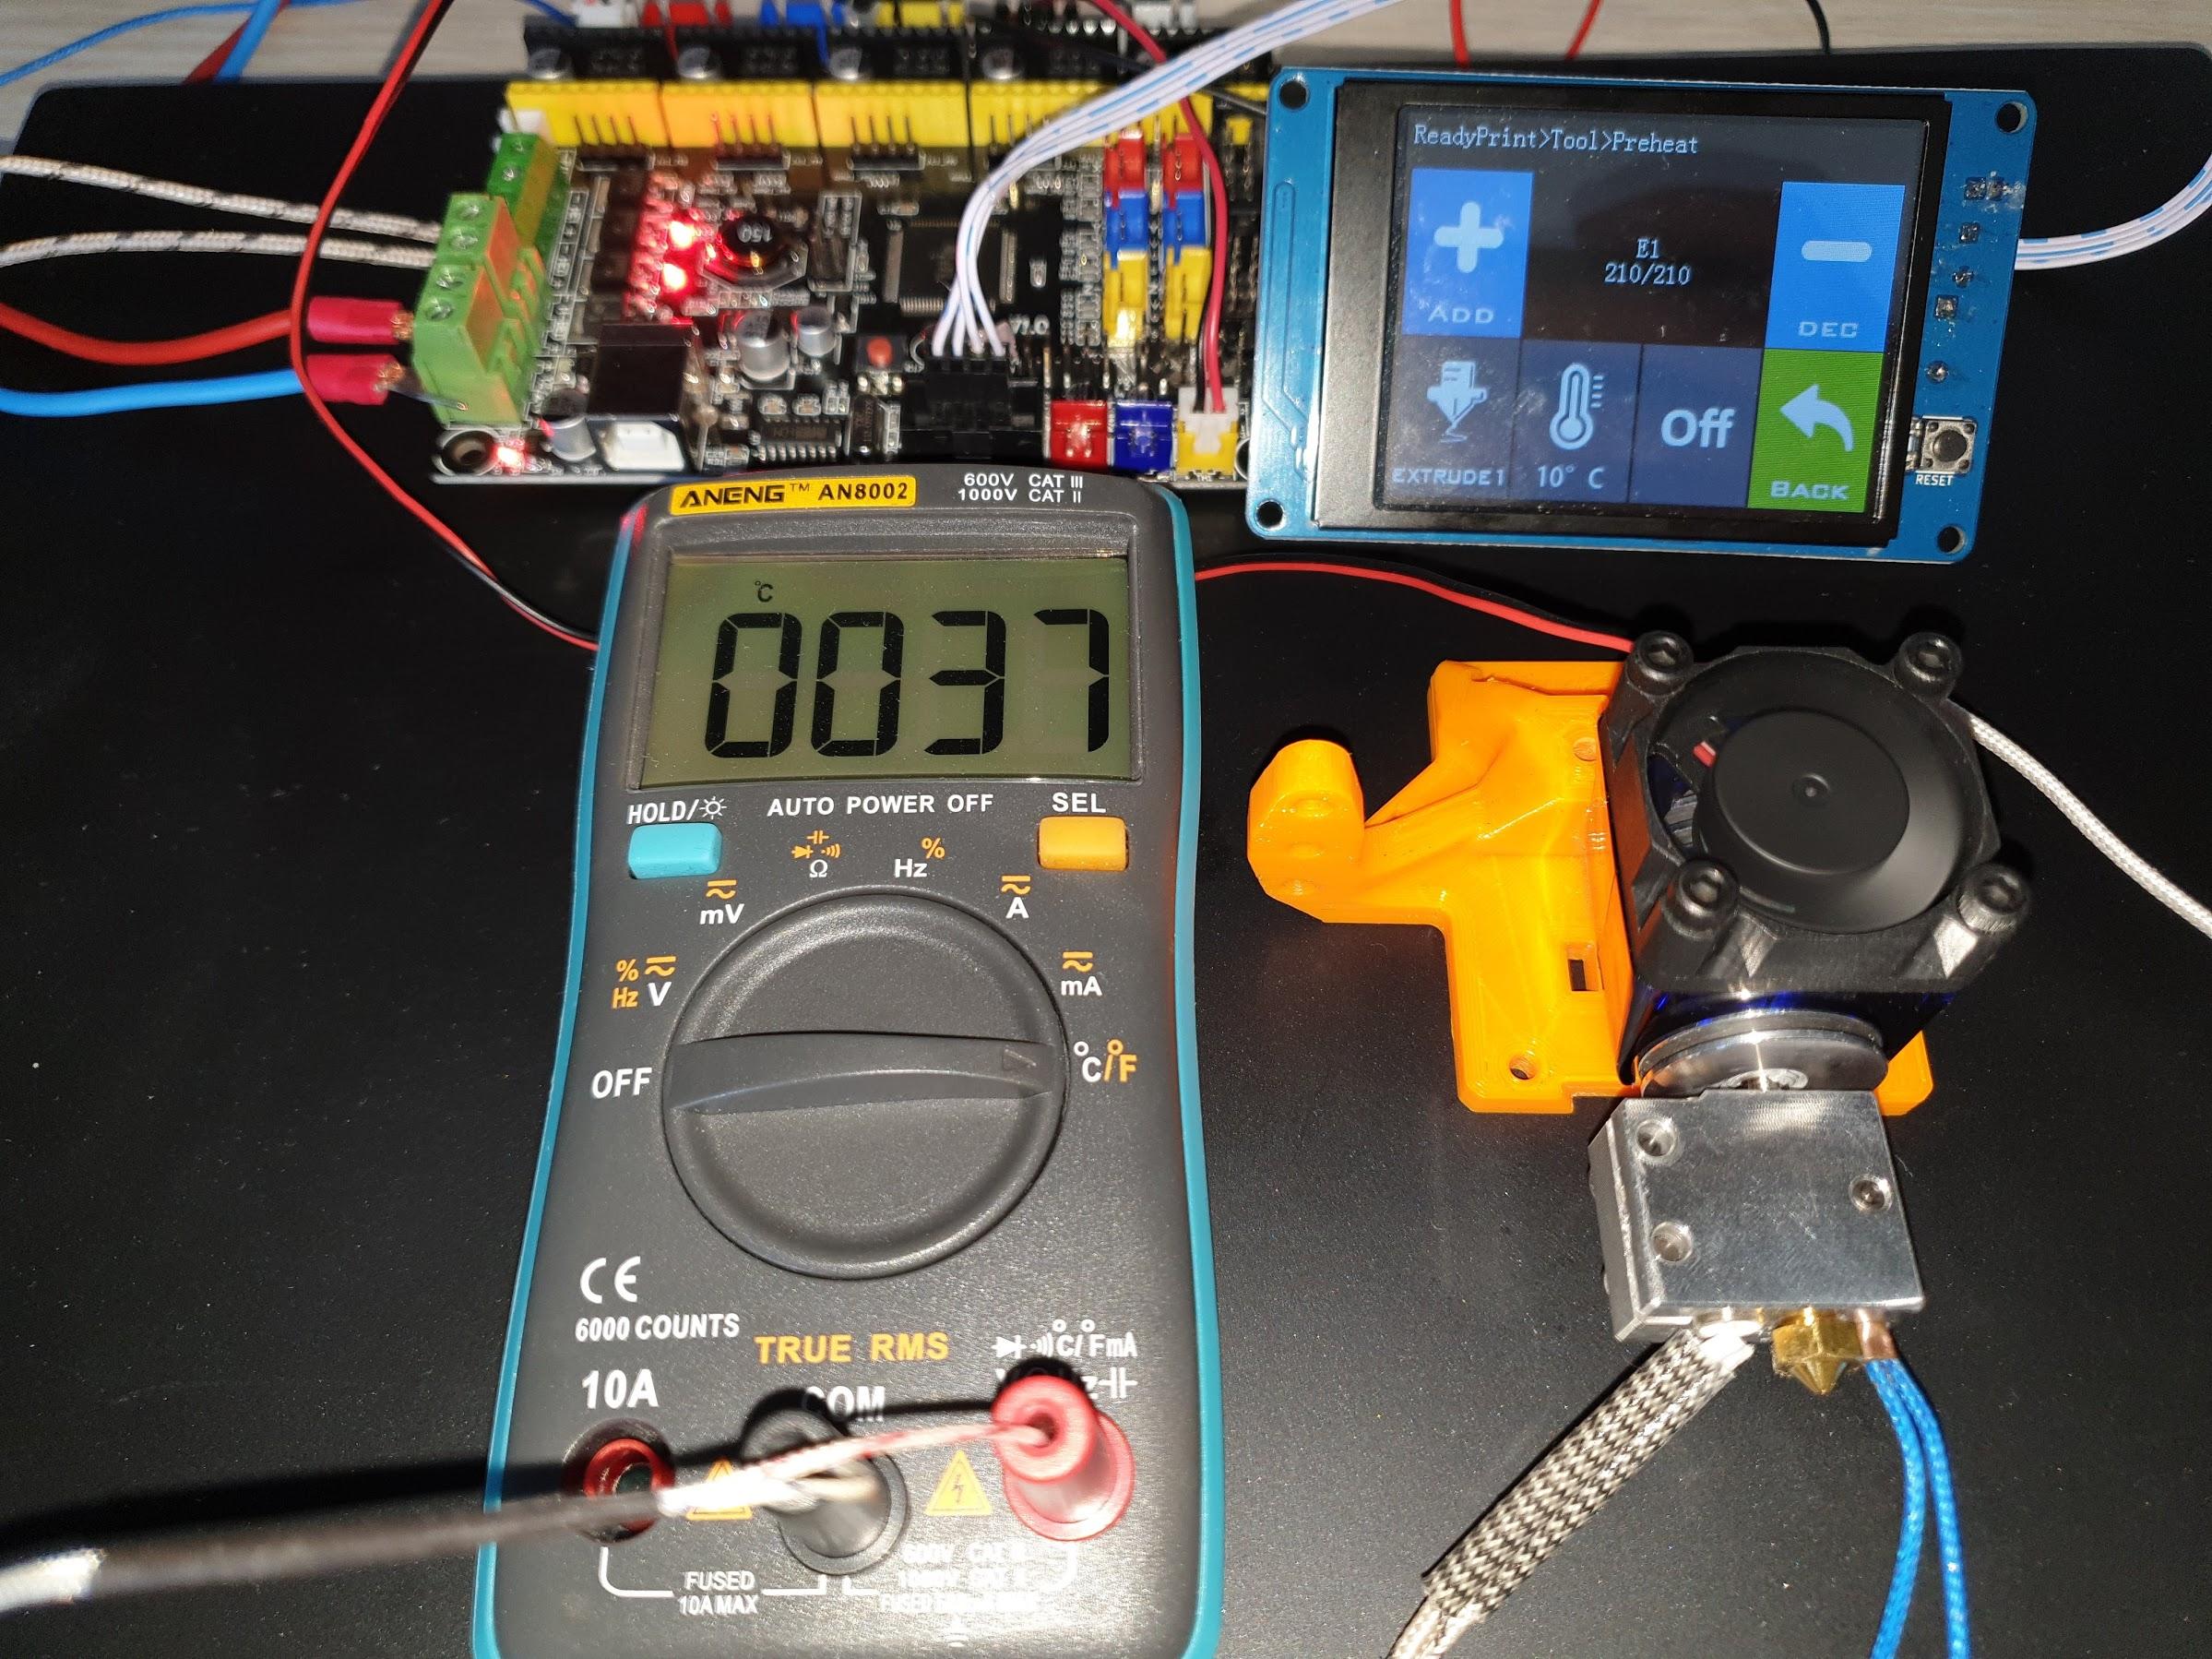 210C Regular Metal V6 Heatsink 10 minutes 37C